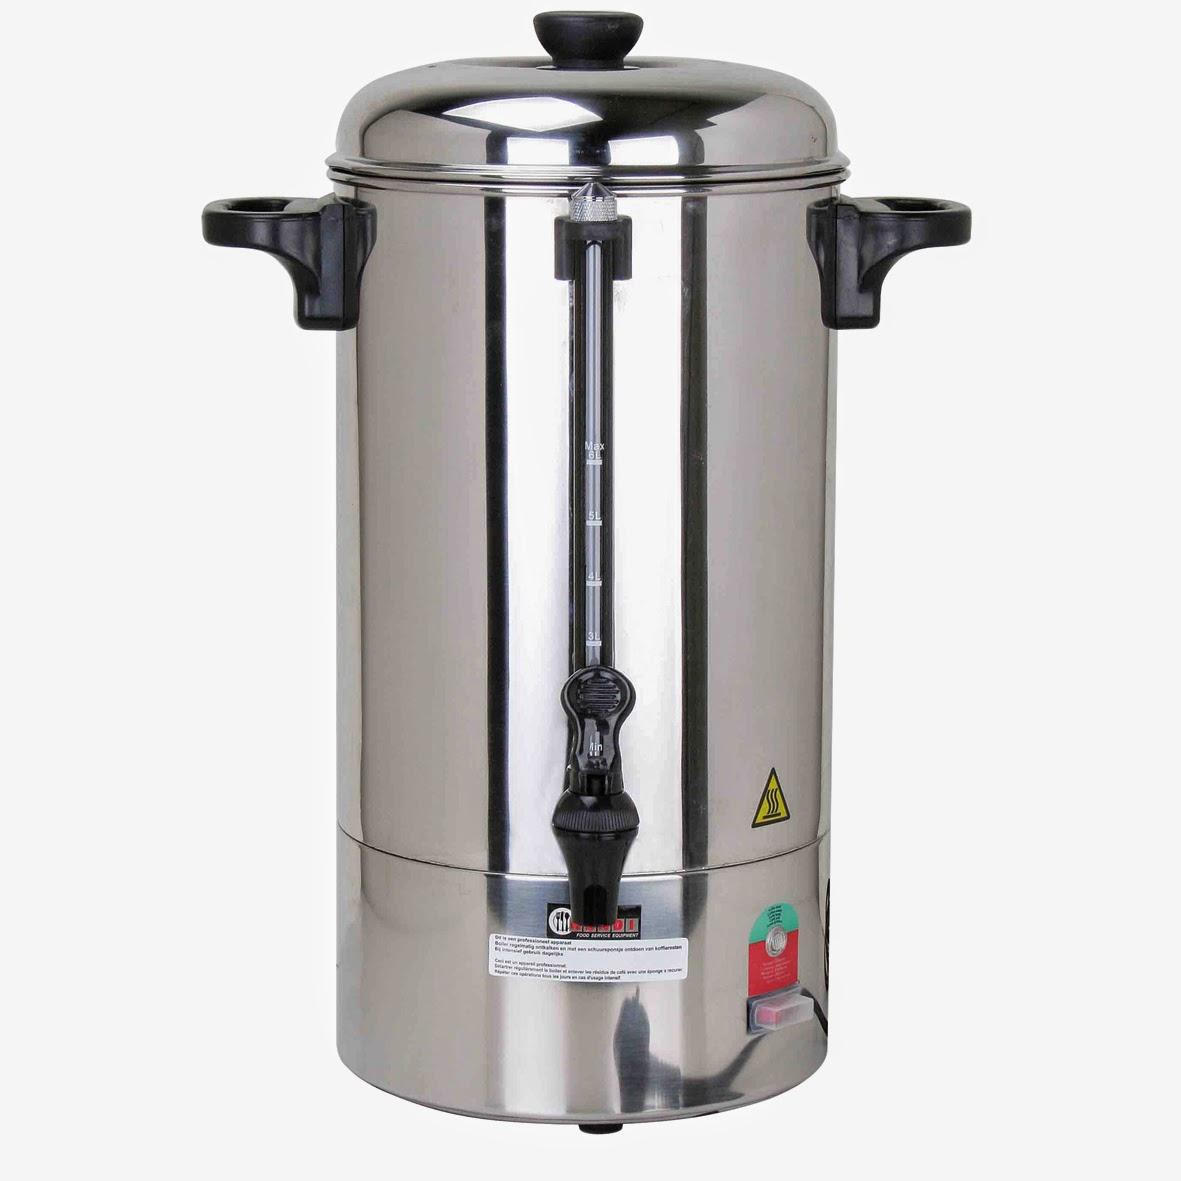 Filtru de Cafea Profesional Horeca, Percolator de 6 Litri din Inox, Capacitate Mare, Garantie si Service in Tara, Pret Redus de 699 RON cu TVA, www.amenajarihoreca.ro